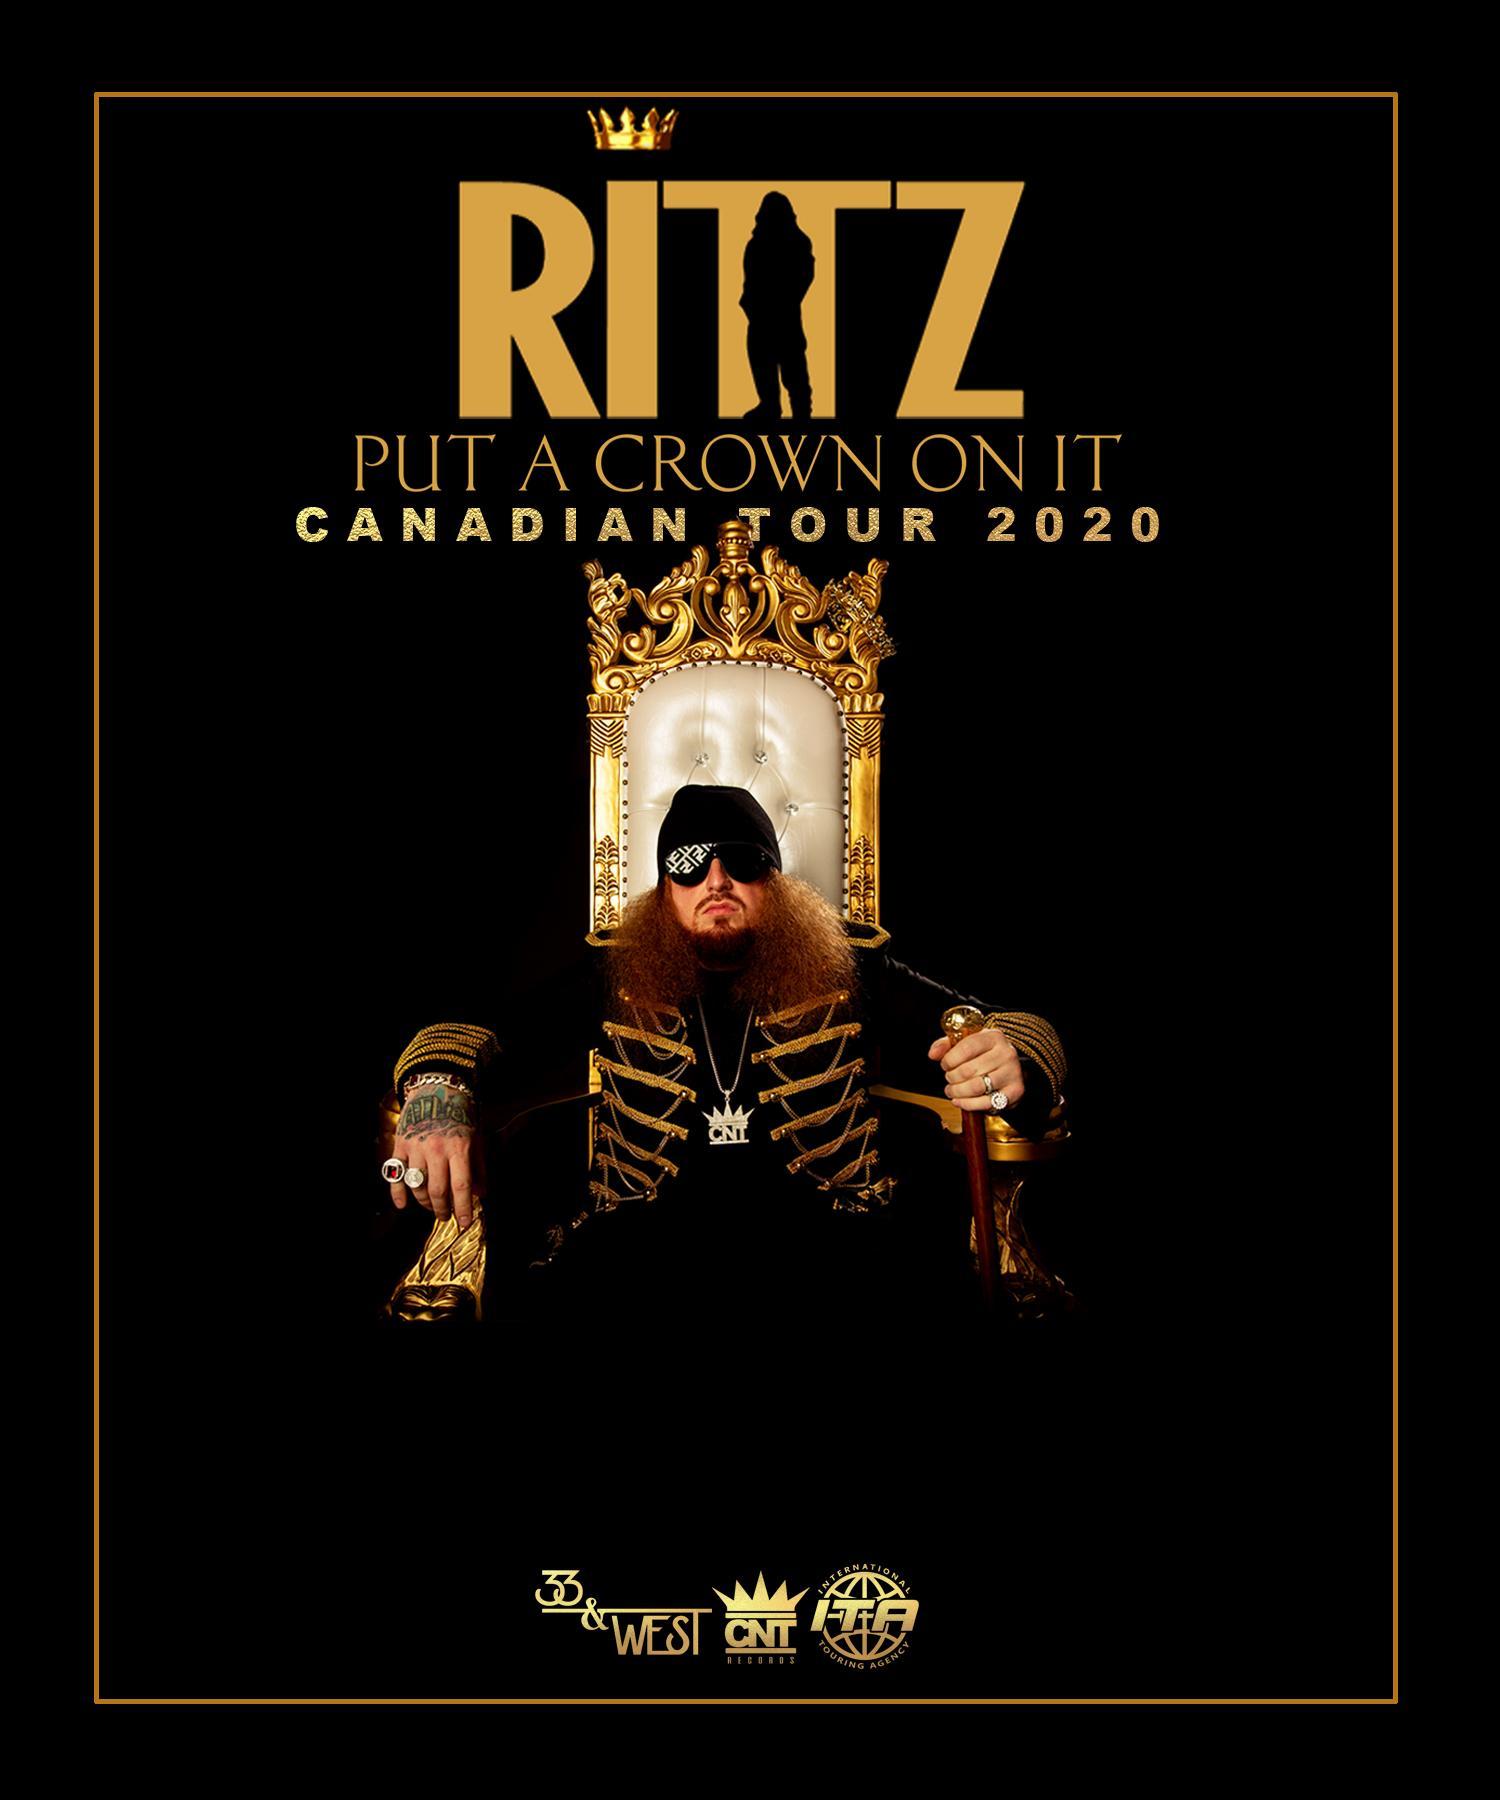 Rittz Live In Ottawa